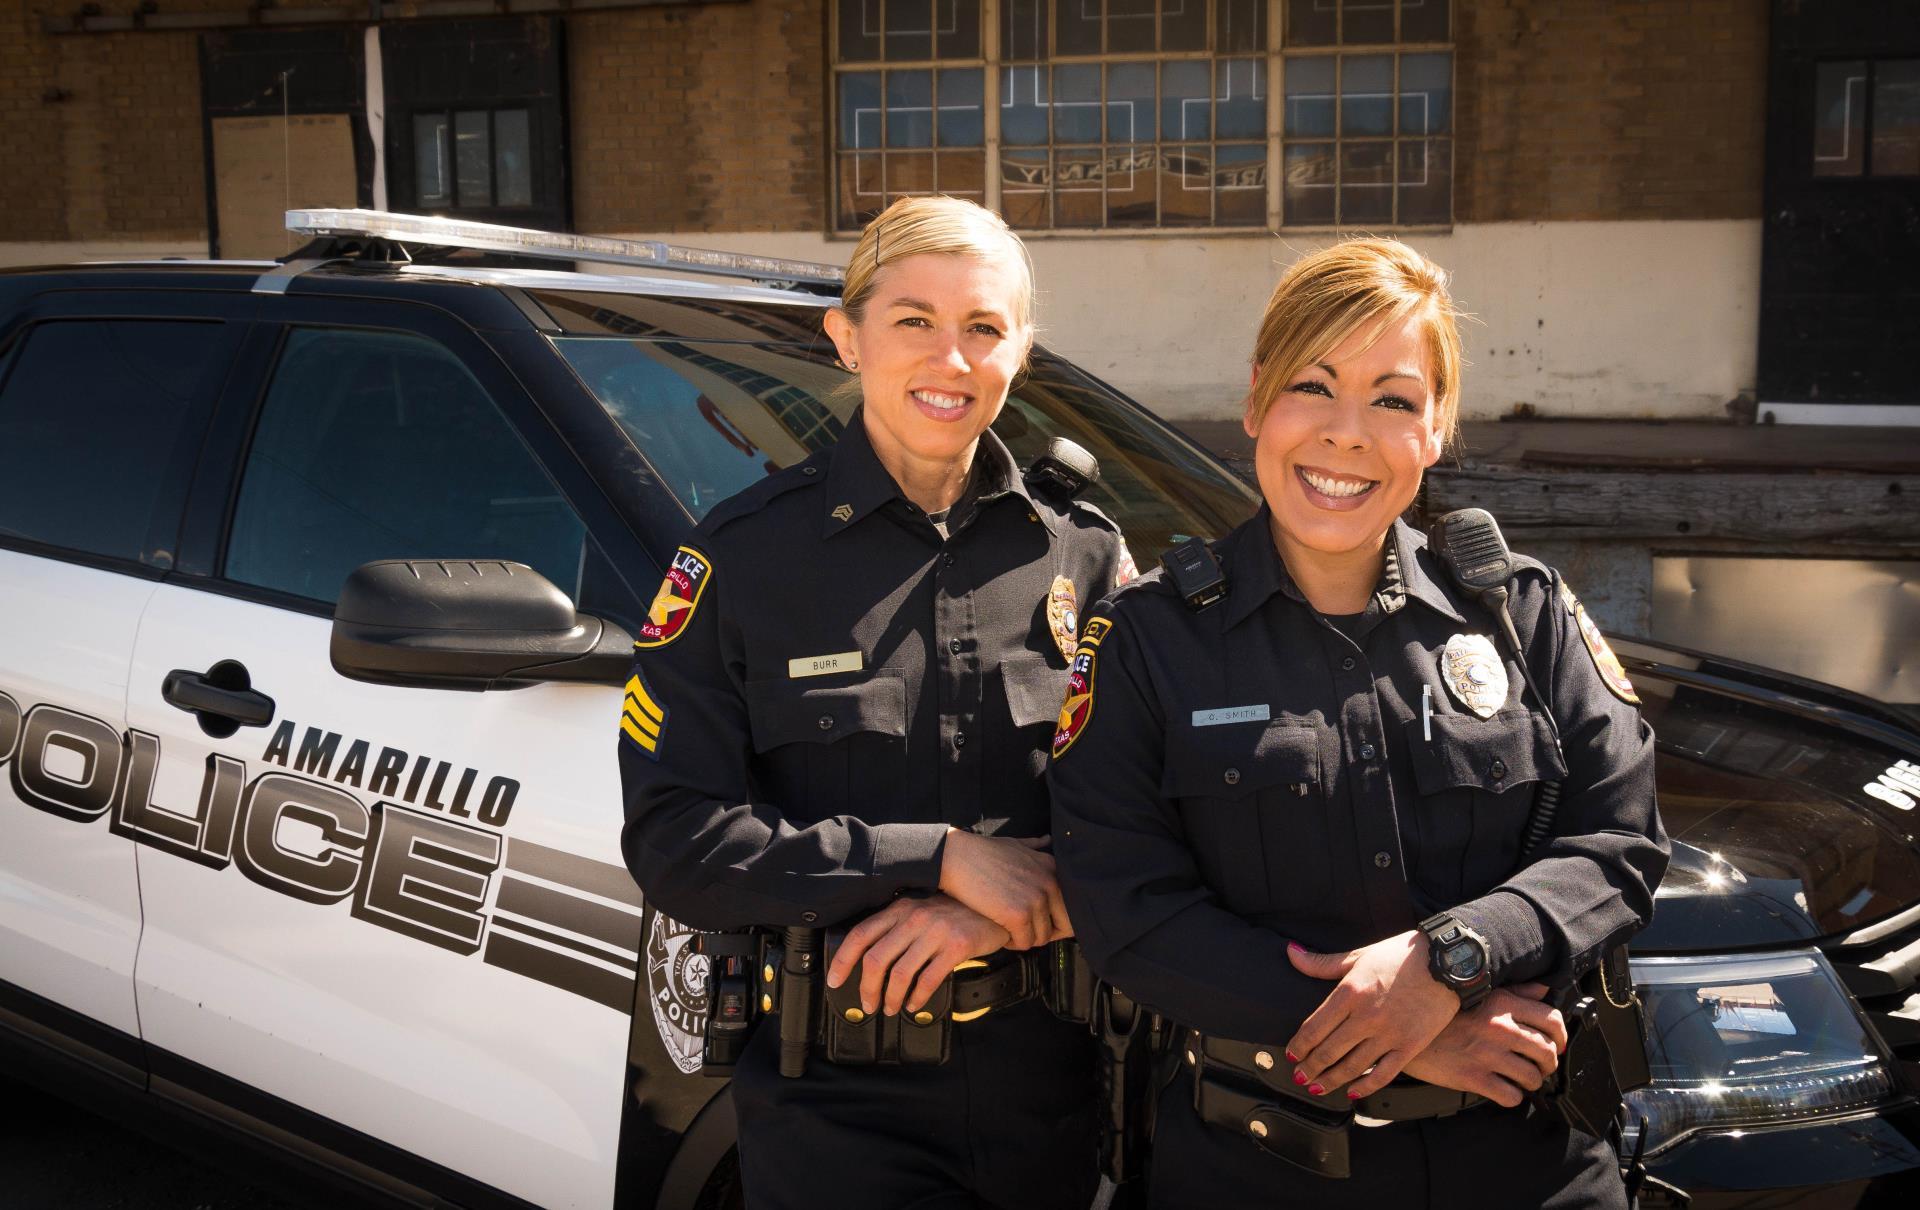 Benefits Salary Requirements City Of Amarillo Tx